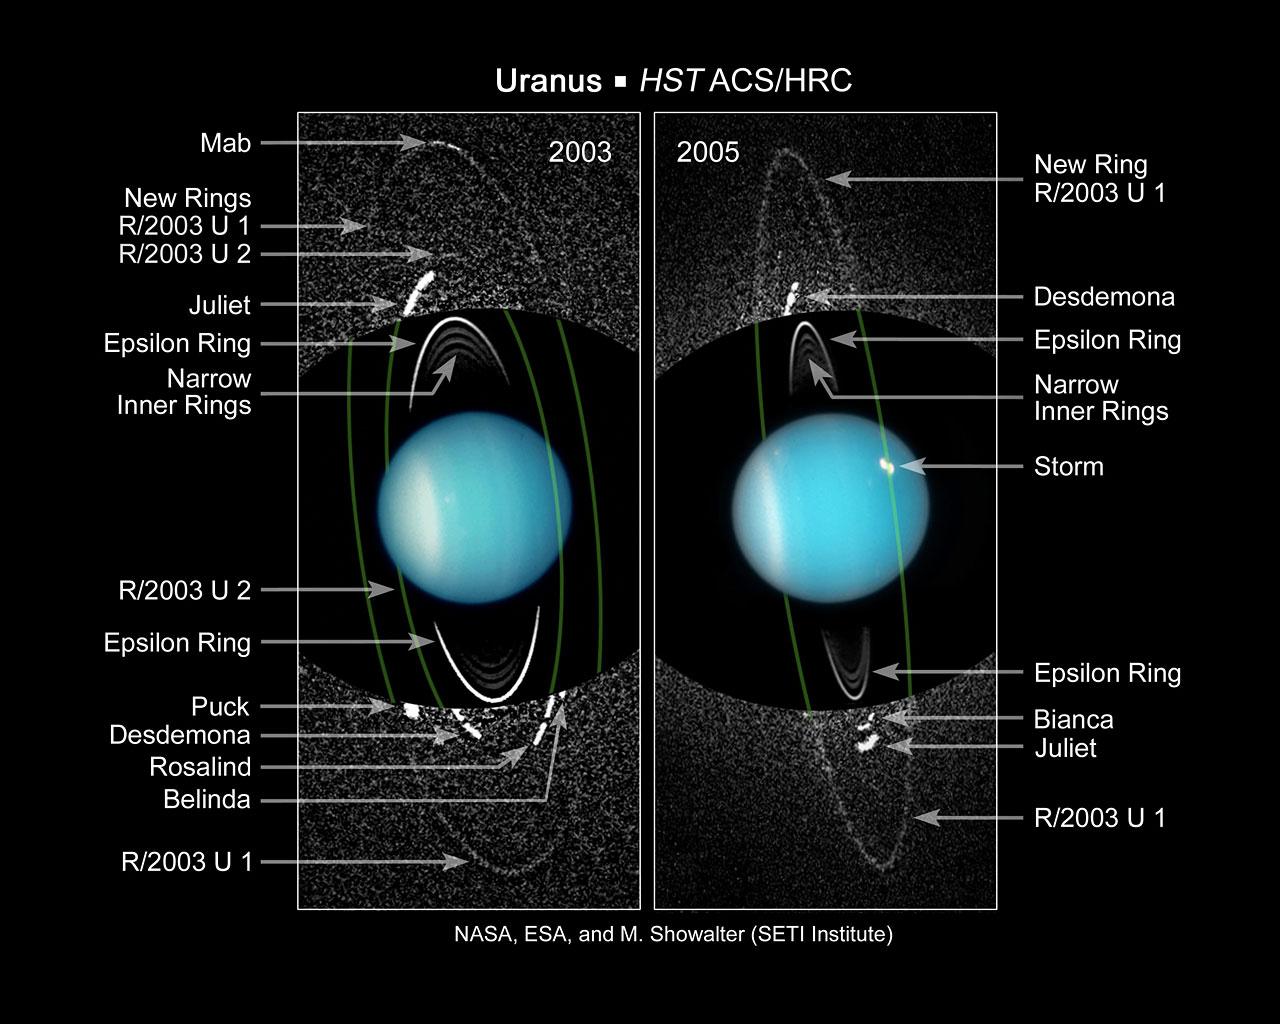 Name Plutos moons  scienceanswerscom